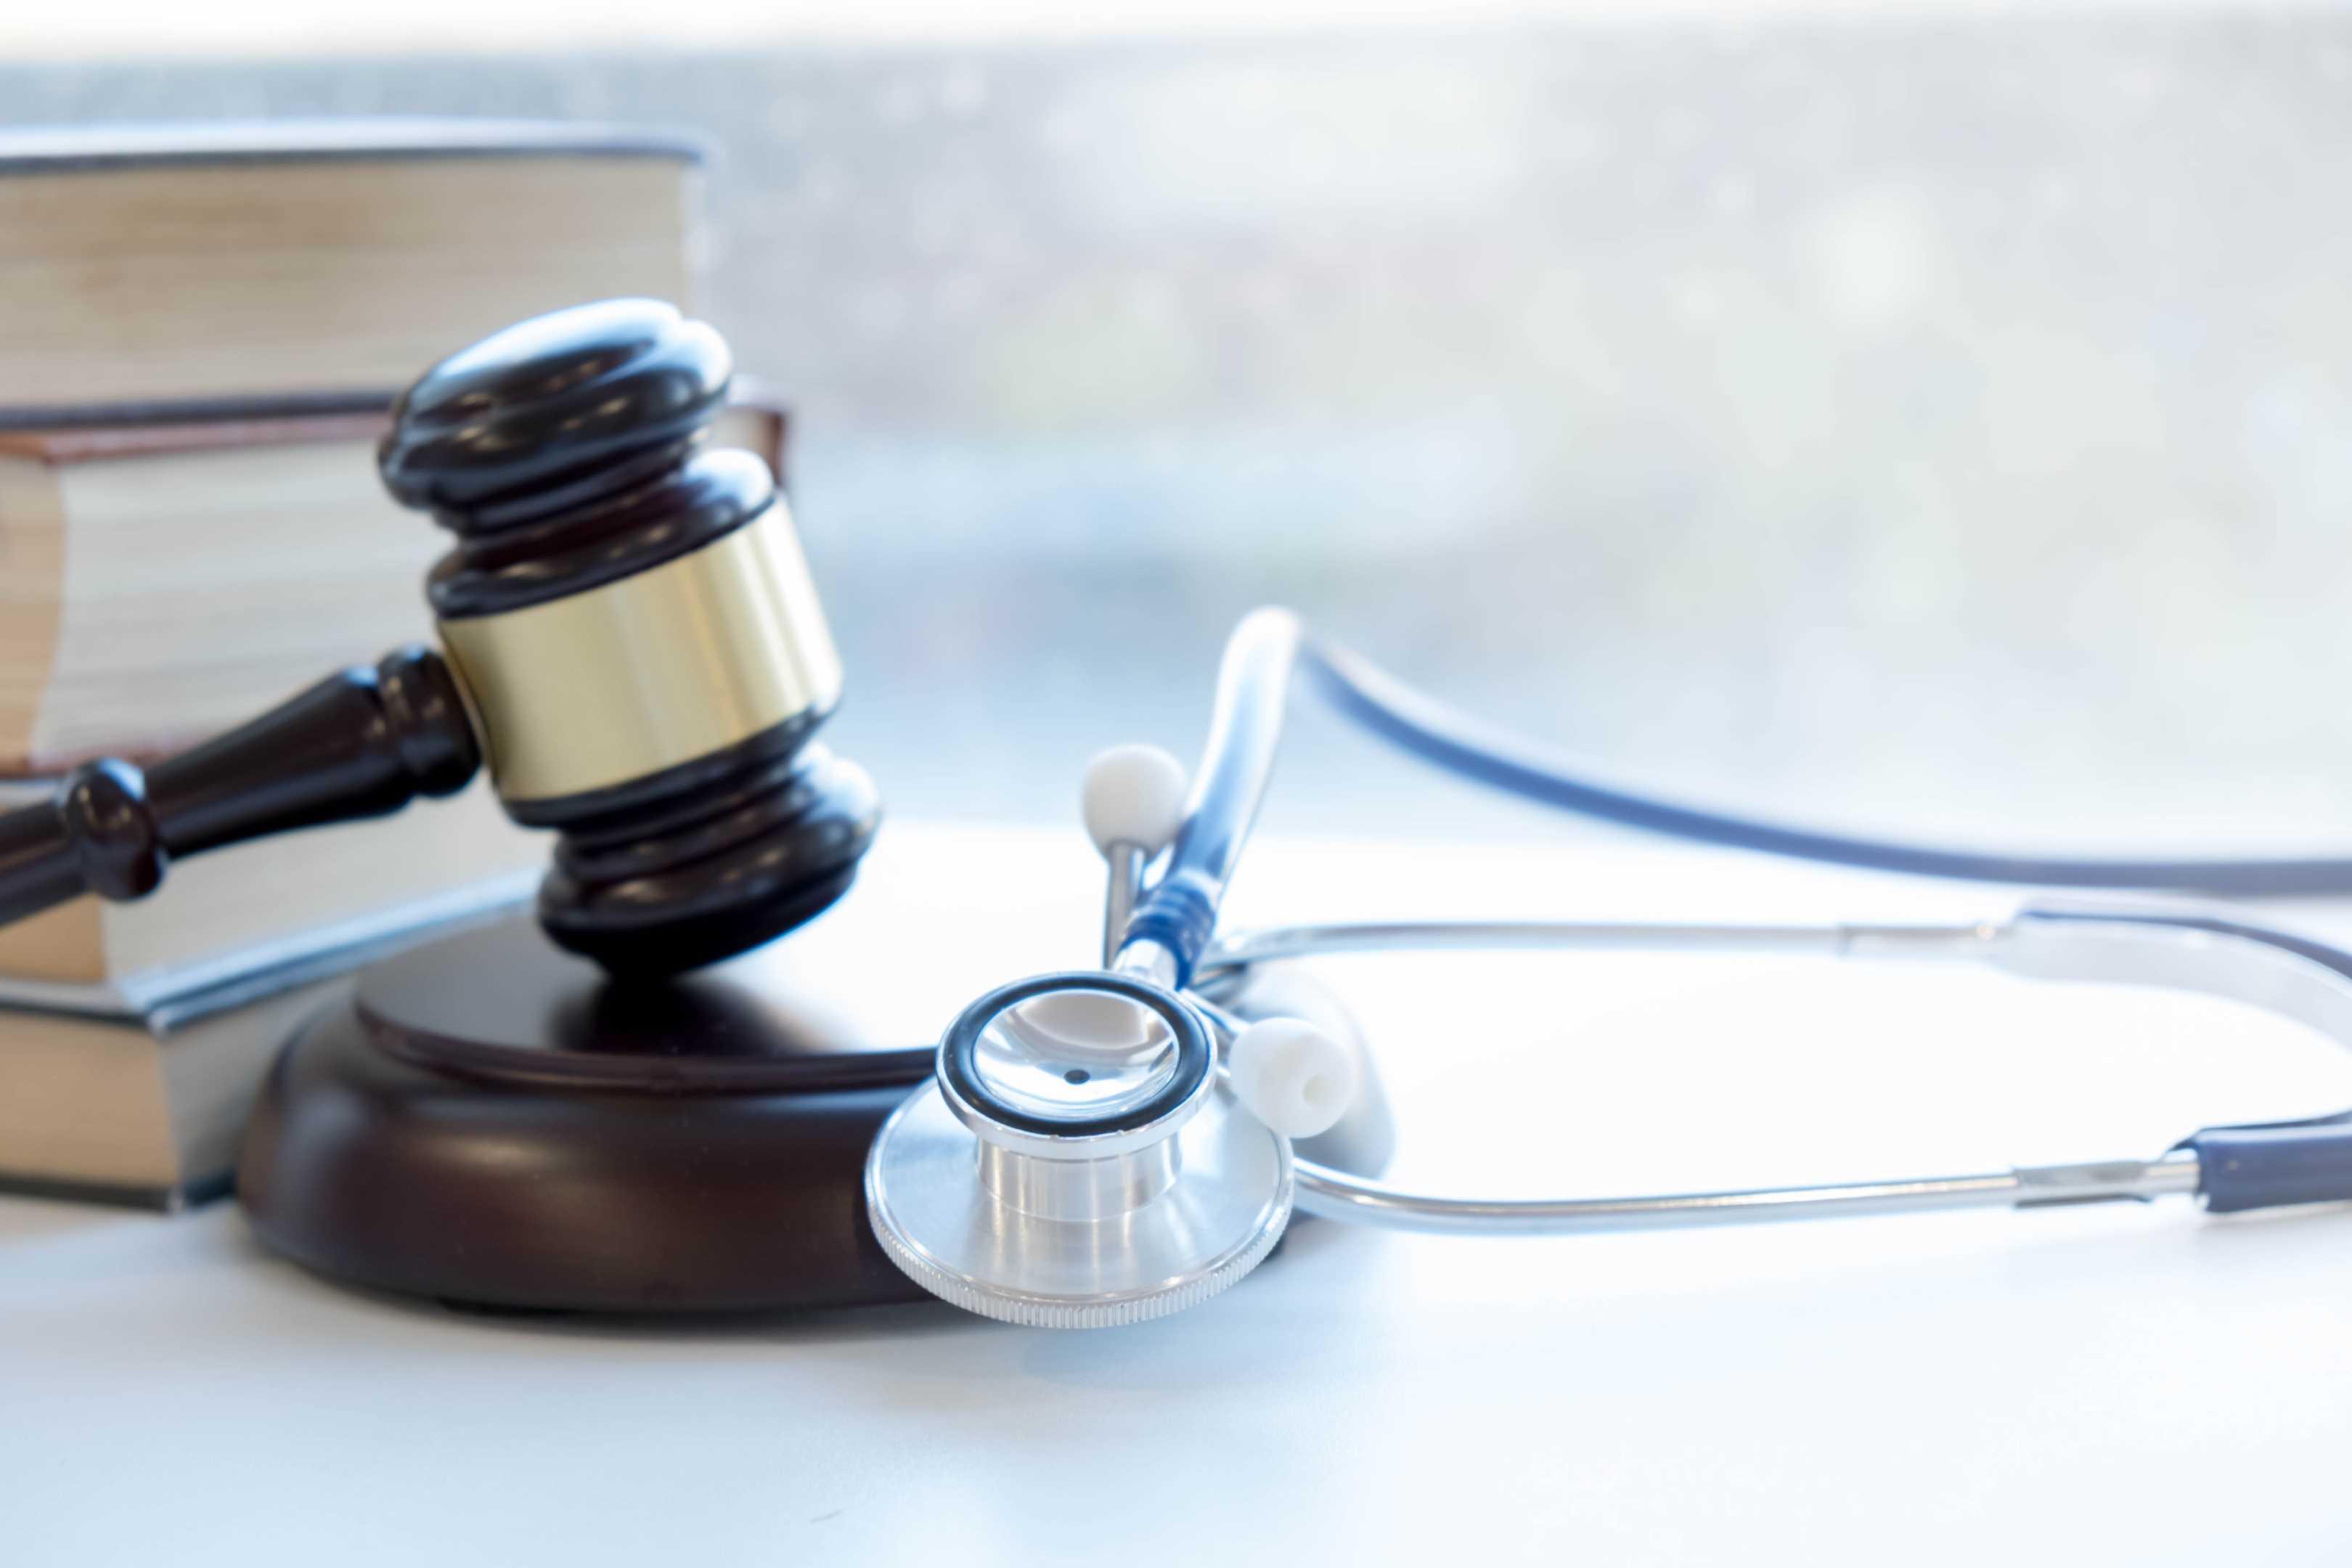 medicina forense_high investigazioni penali